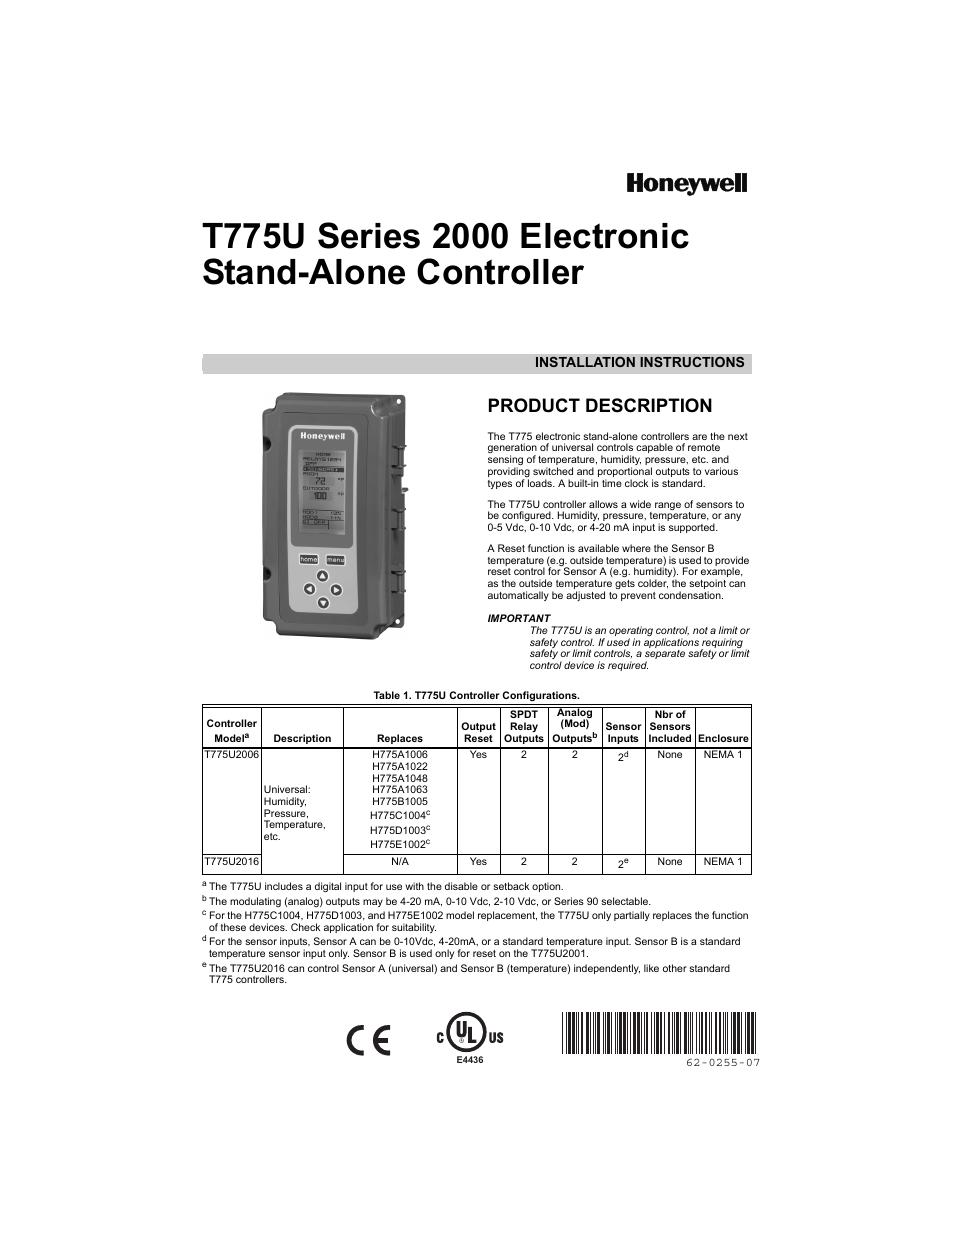 honeywell t775u user manual 40 pages Honeywell VAV Controller honeywell t775 controller installation manual